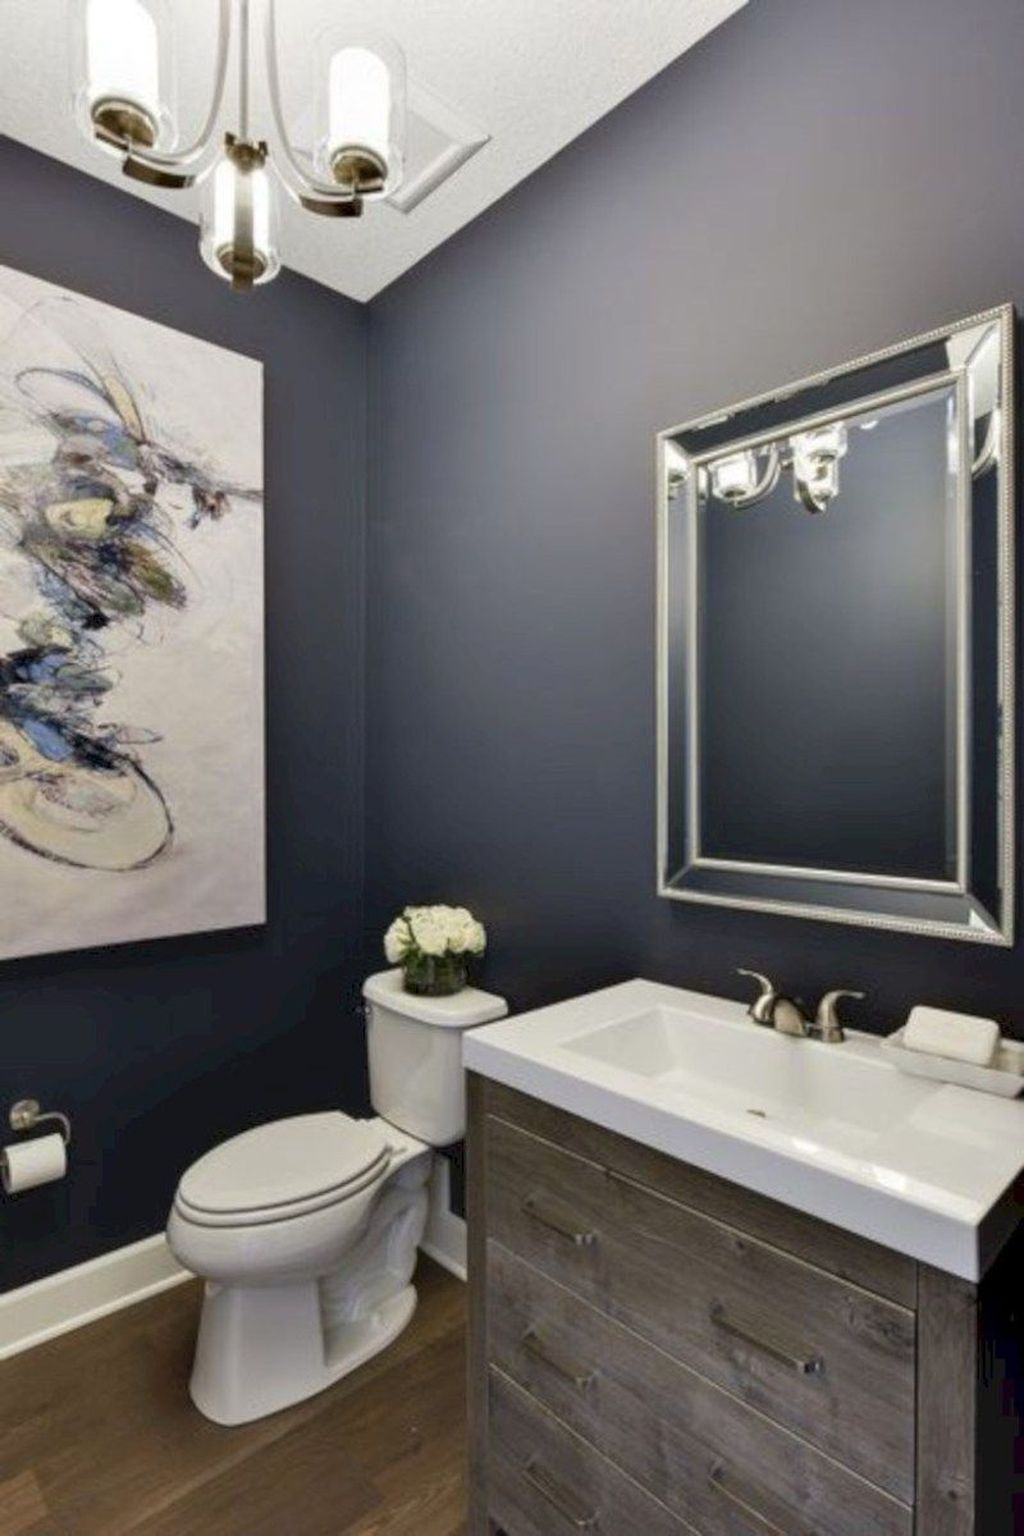 30 Elegant Farmhouse Bathroom Wall Color Ideas Coodecor Bathroom Paint Colors Blue Powder Rooms Painting Bathroom